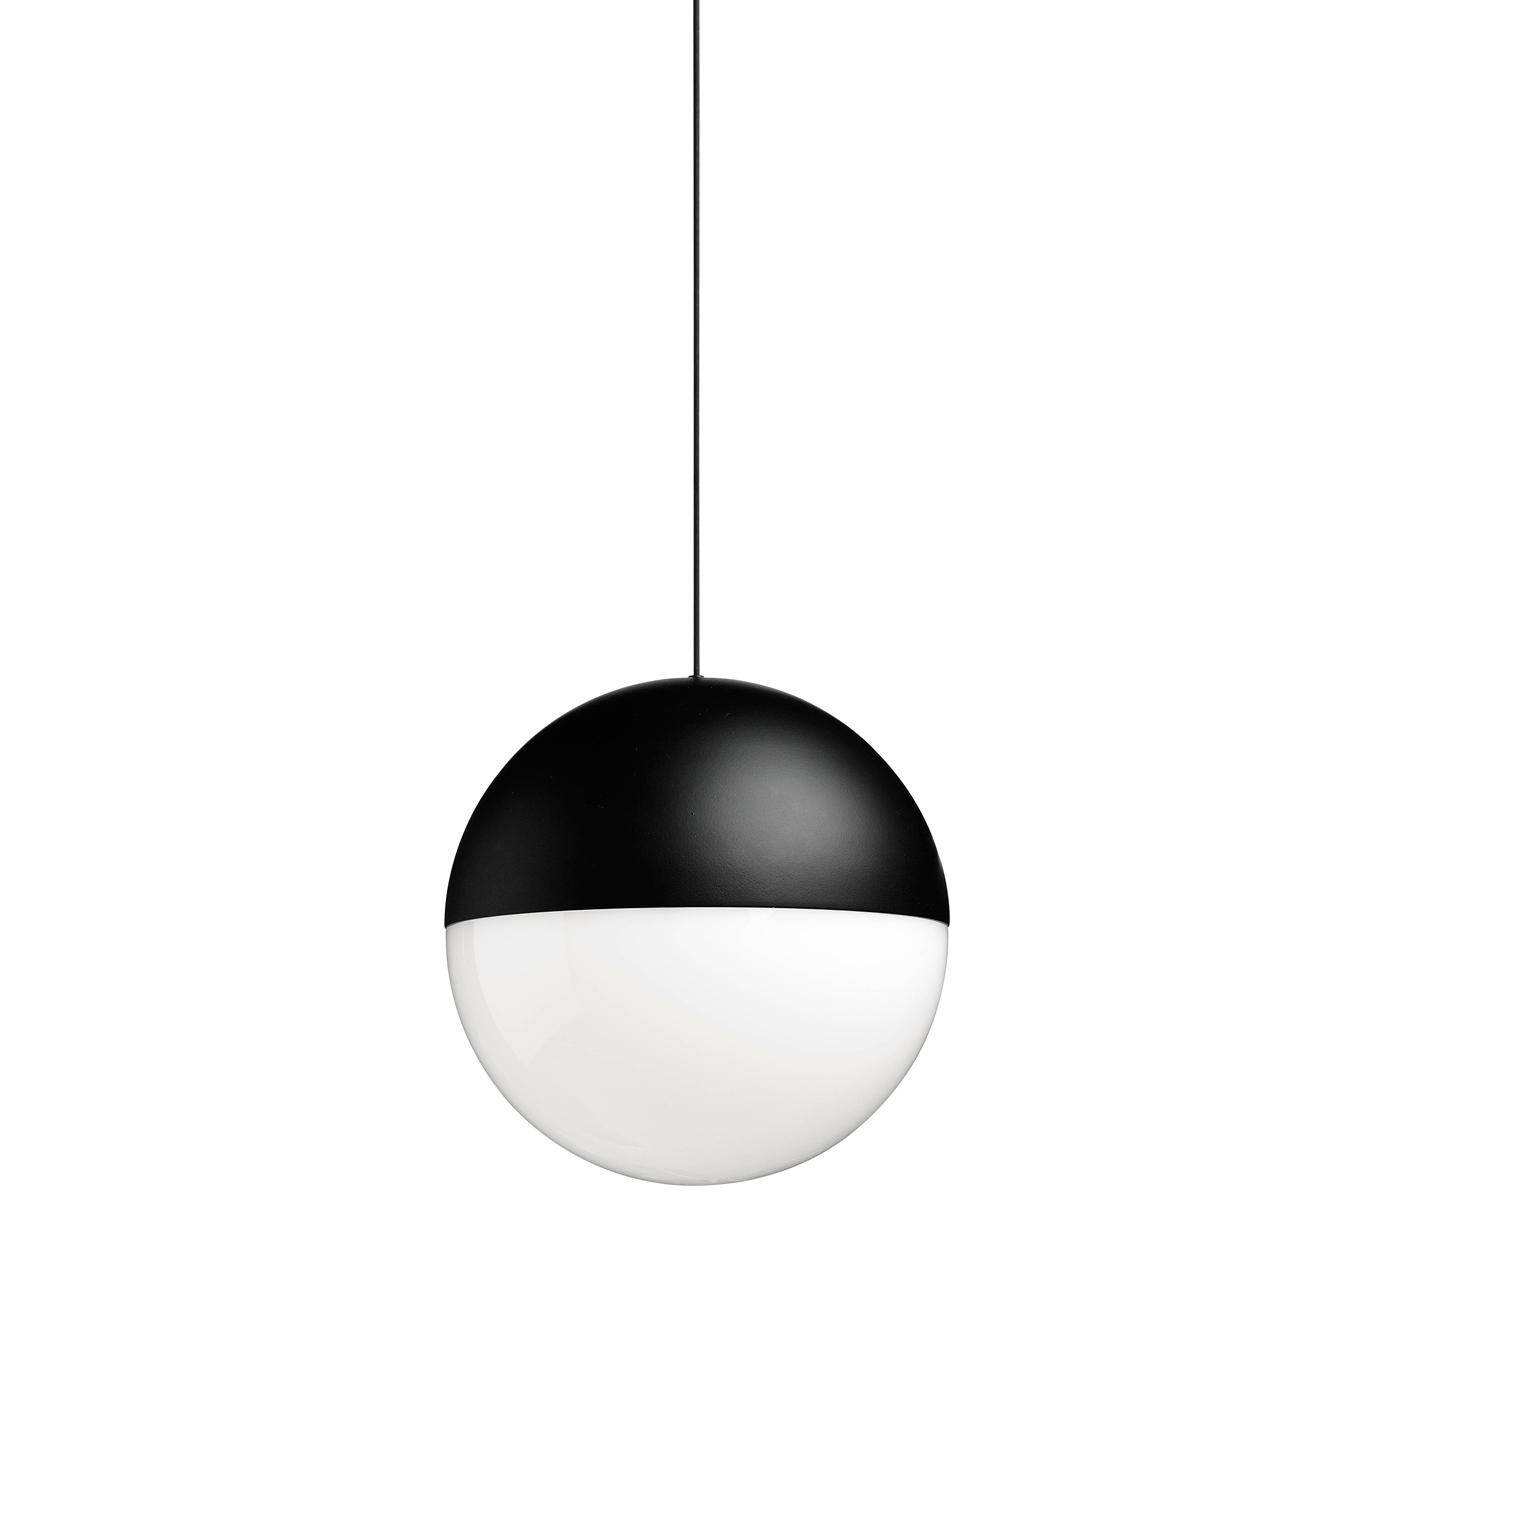 String Light Lighting System